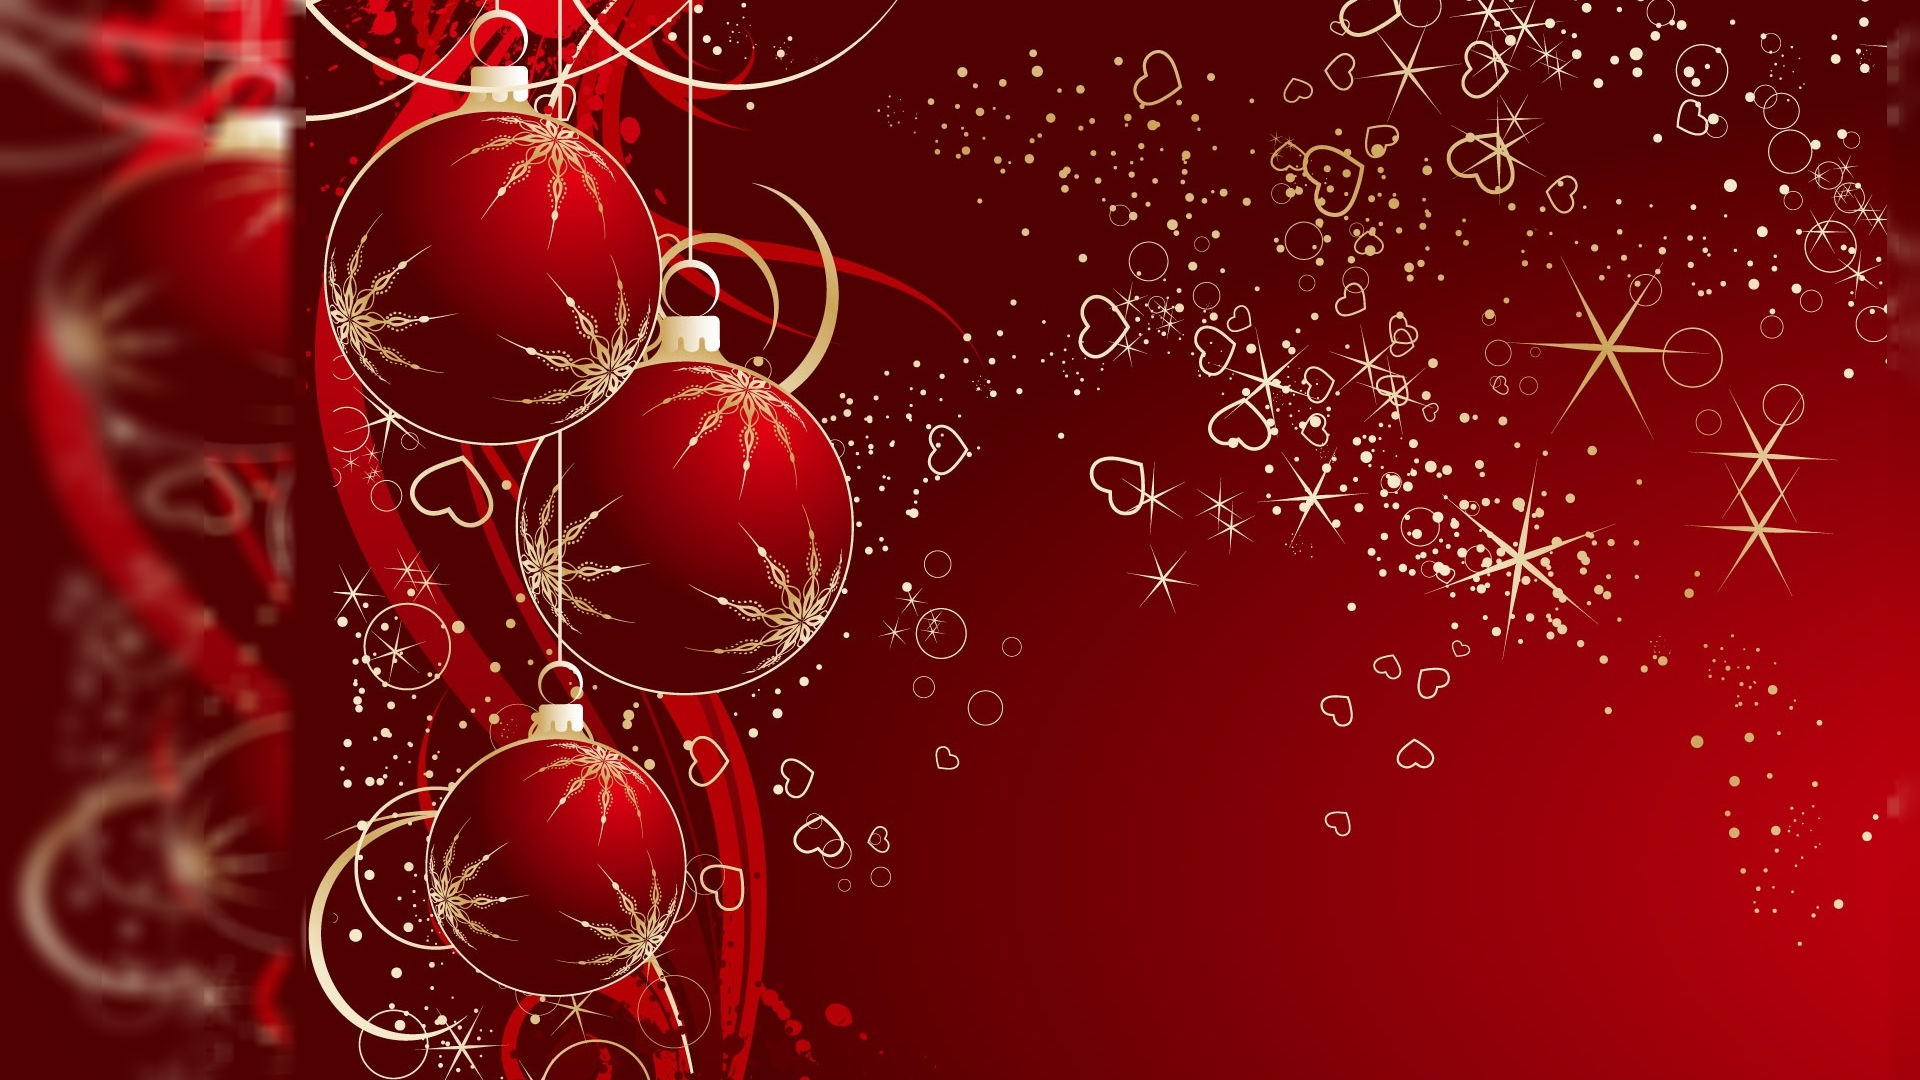 Christmas Desktop Backgrounds Christmas Desktop Backgrounds for 1920x1080